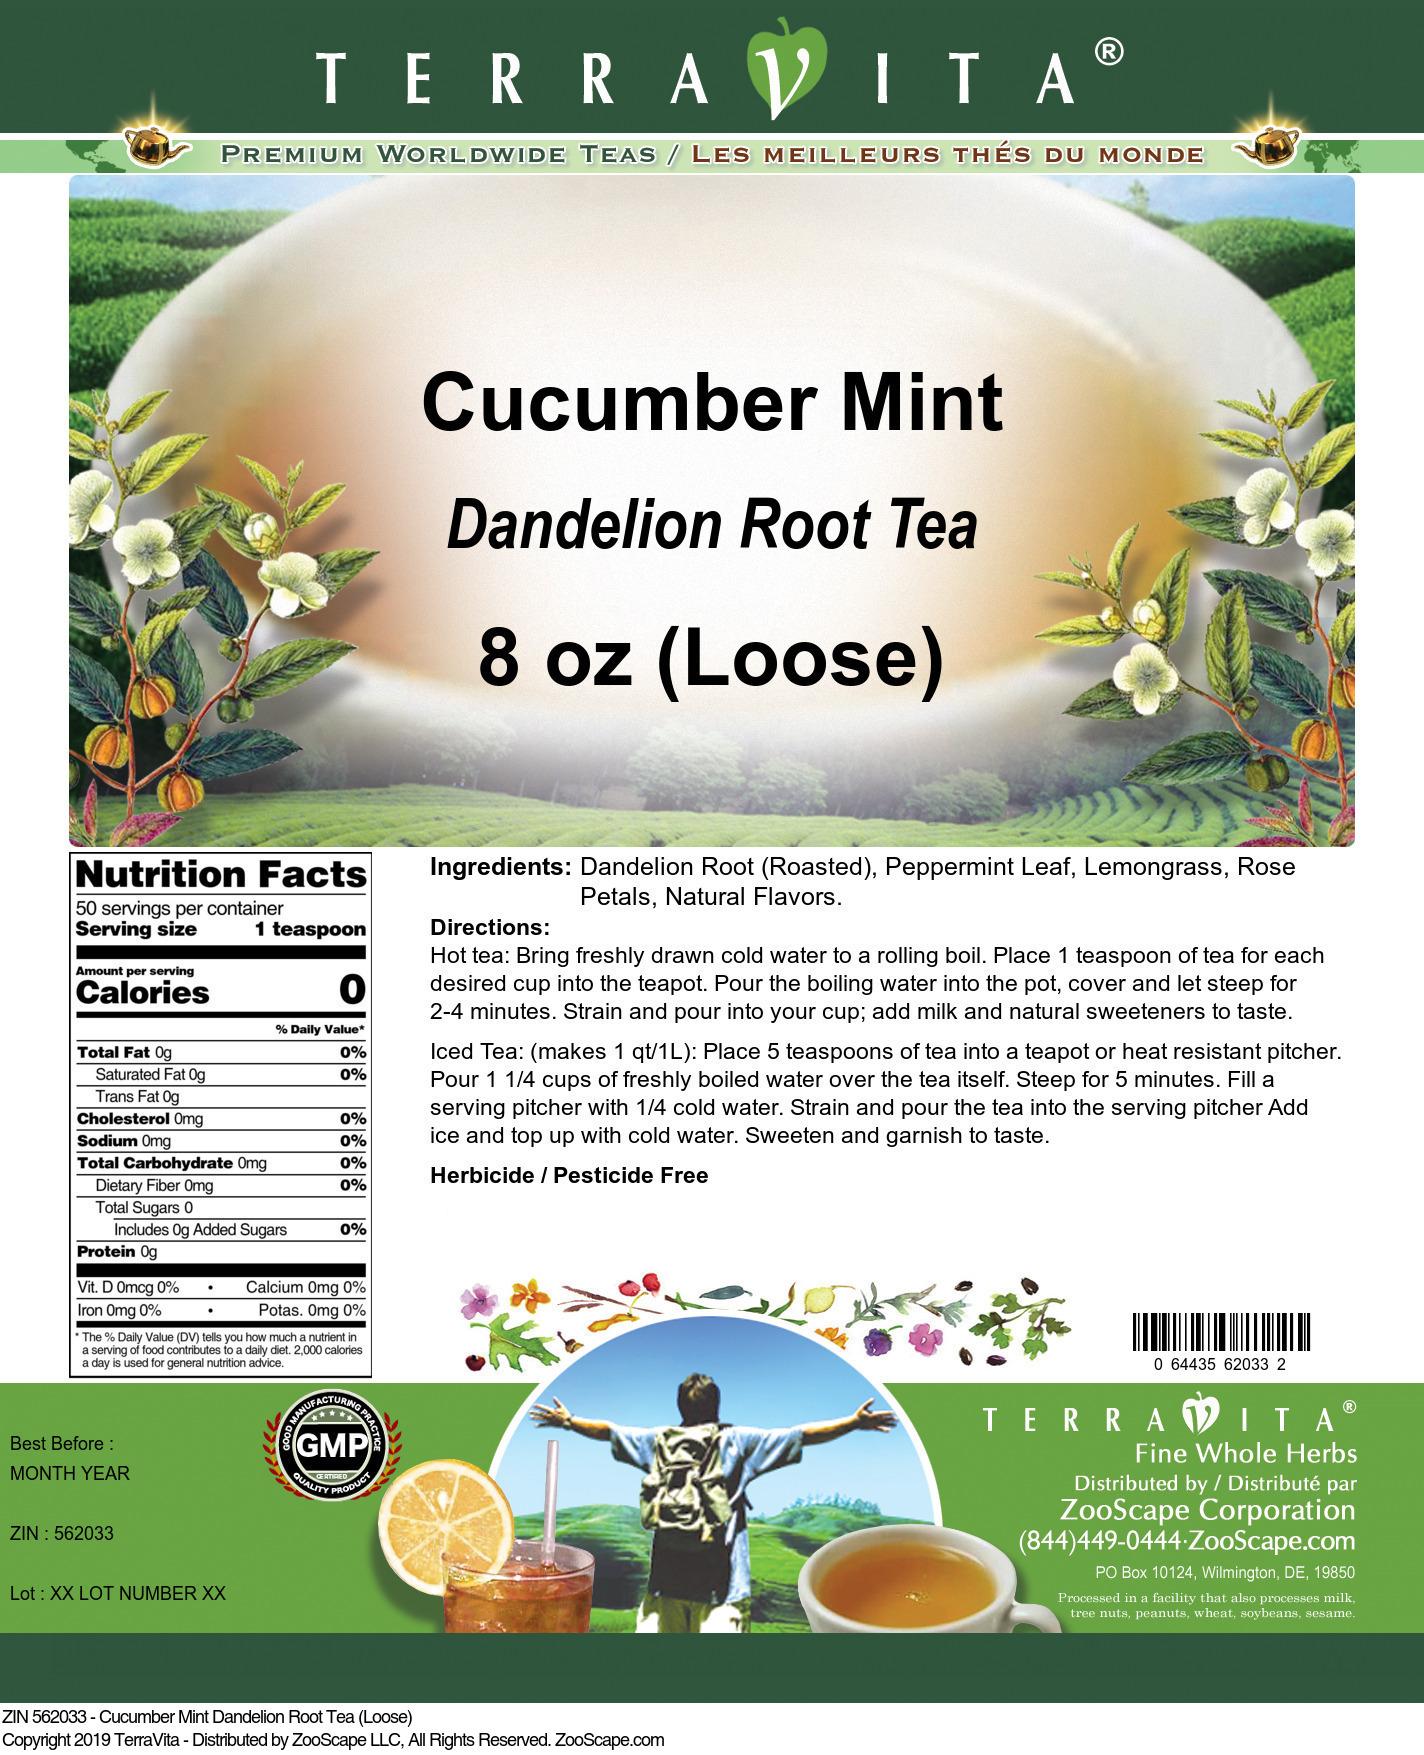 Cucumber Mint Dandelion Root Tea (Loose)